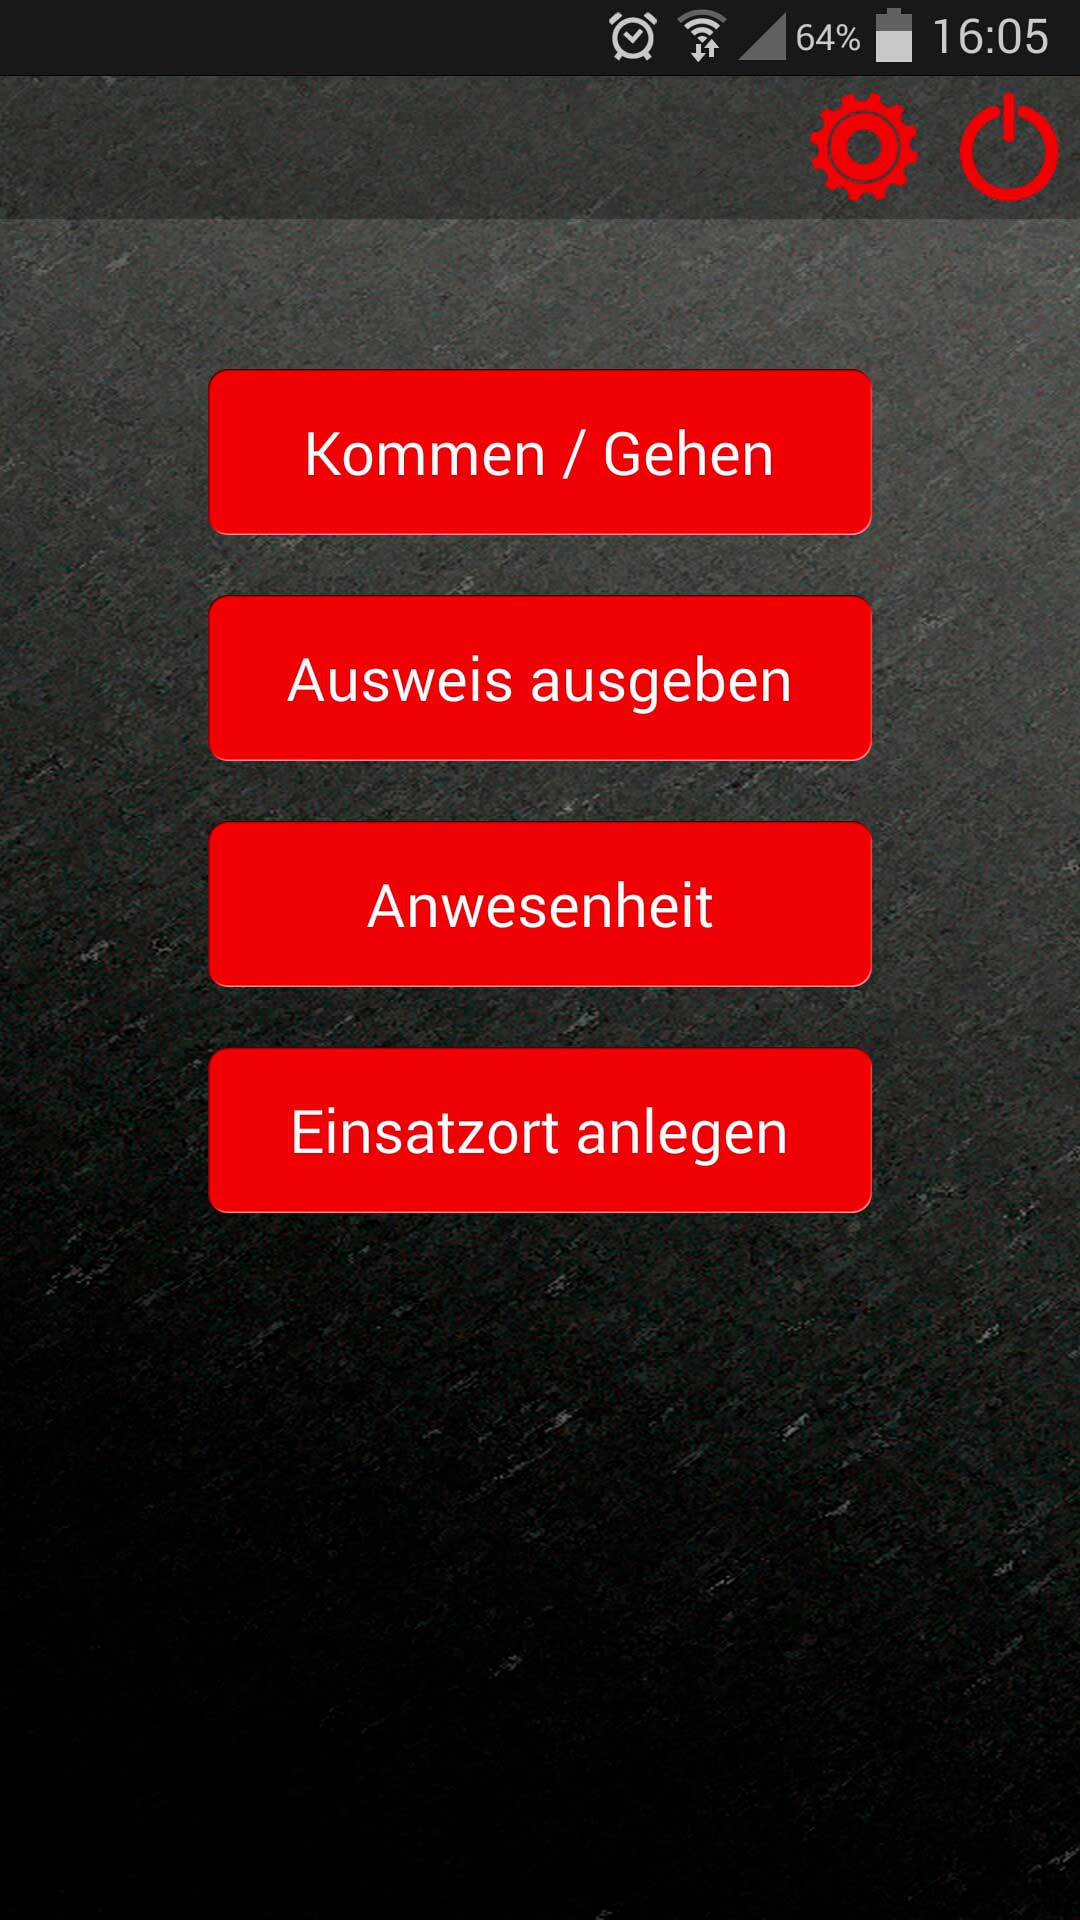 ginstr_timeRecording_DE_2